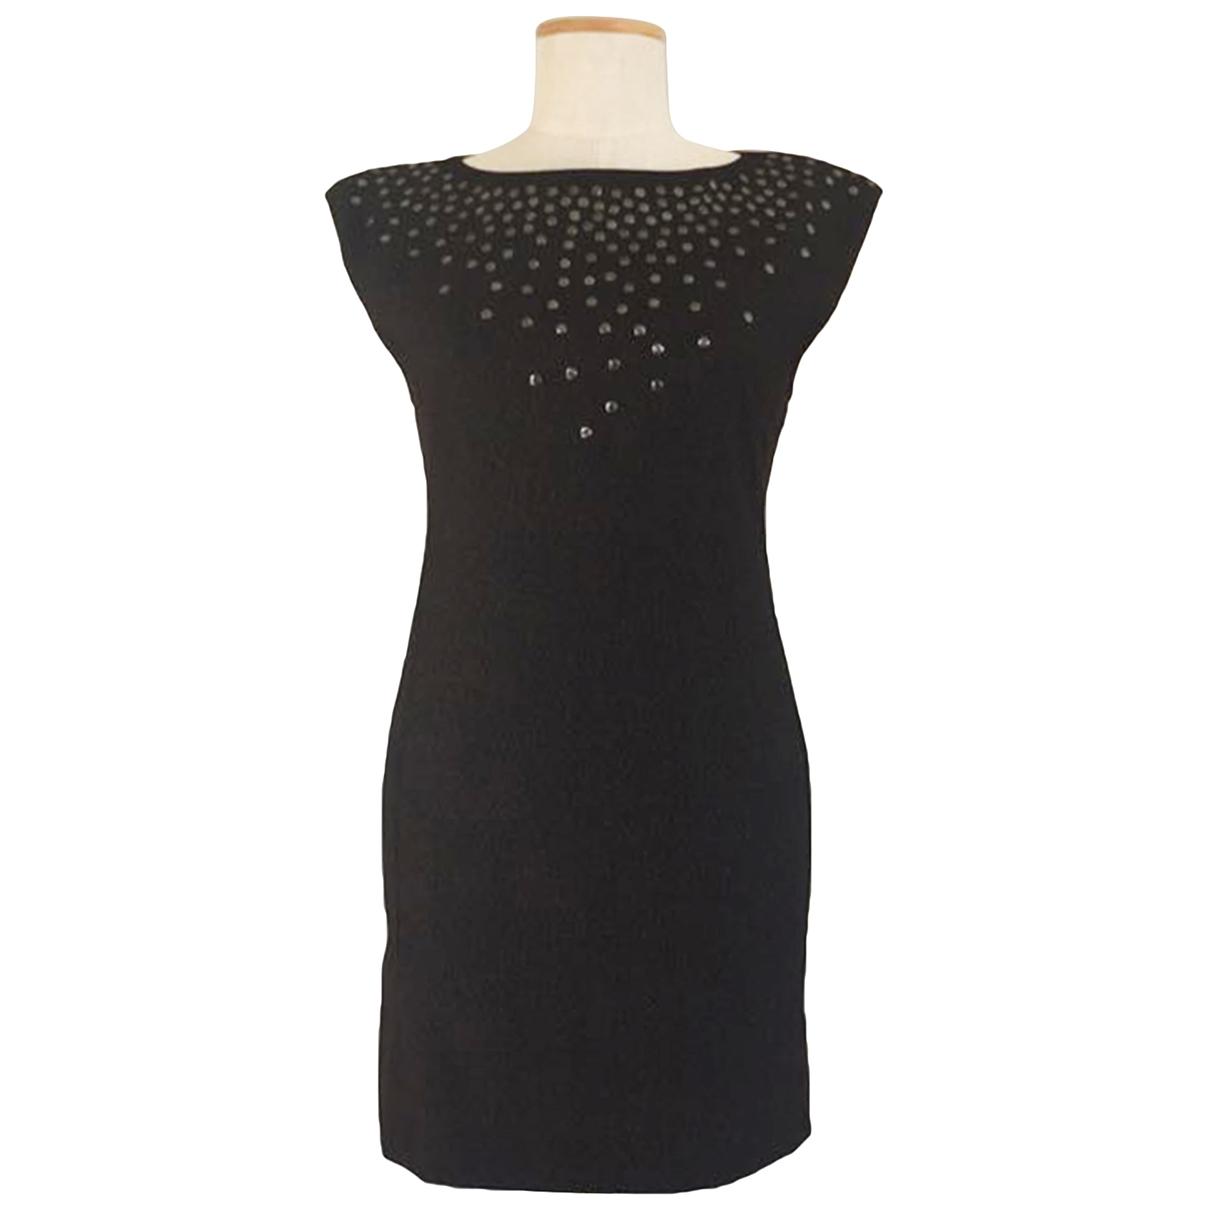 Patrizia Pepe \N Anthracite Wool dress for Women 40 IT